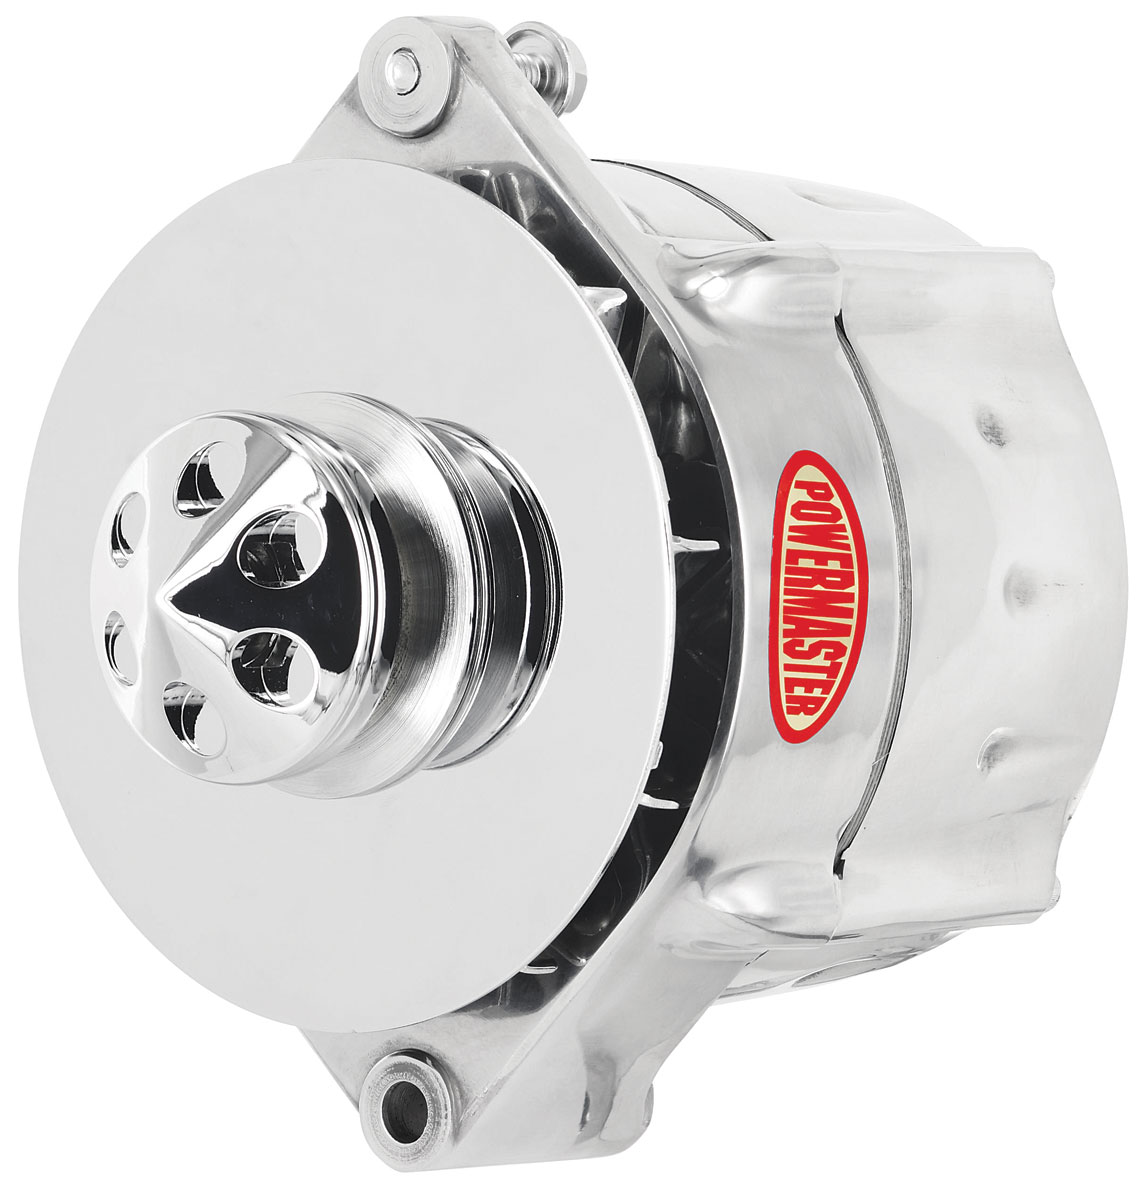 Alternator, Powermaster, 59-88 GM Cars, 12SI, Smooth, Polished, 150AMP, 1V